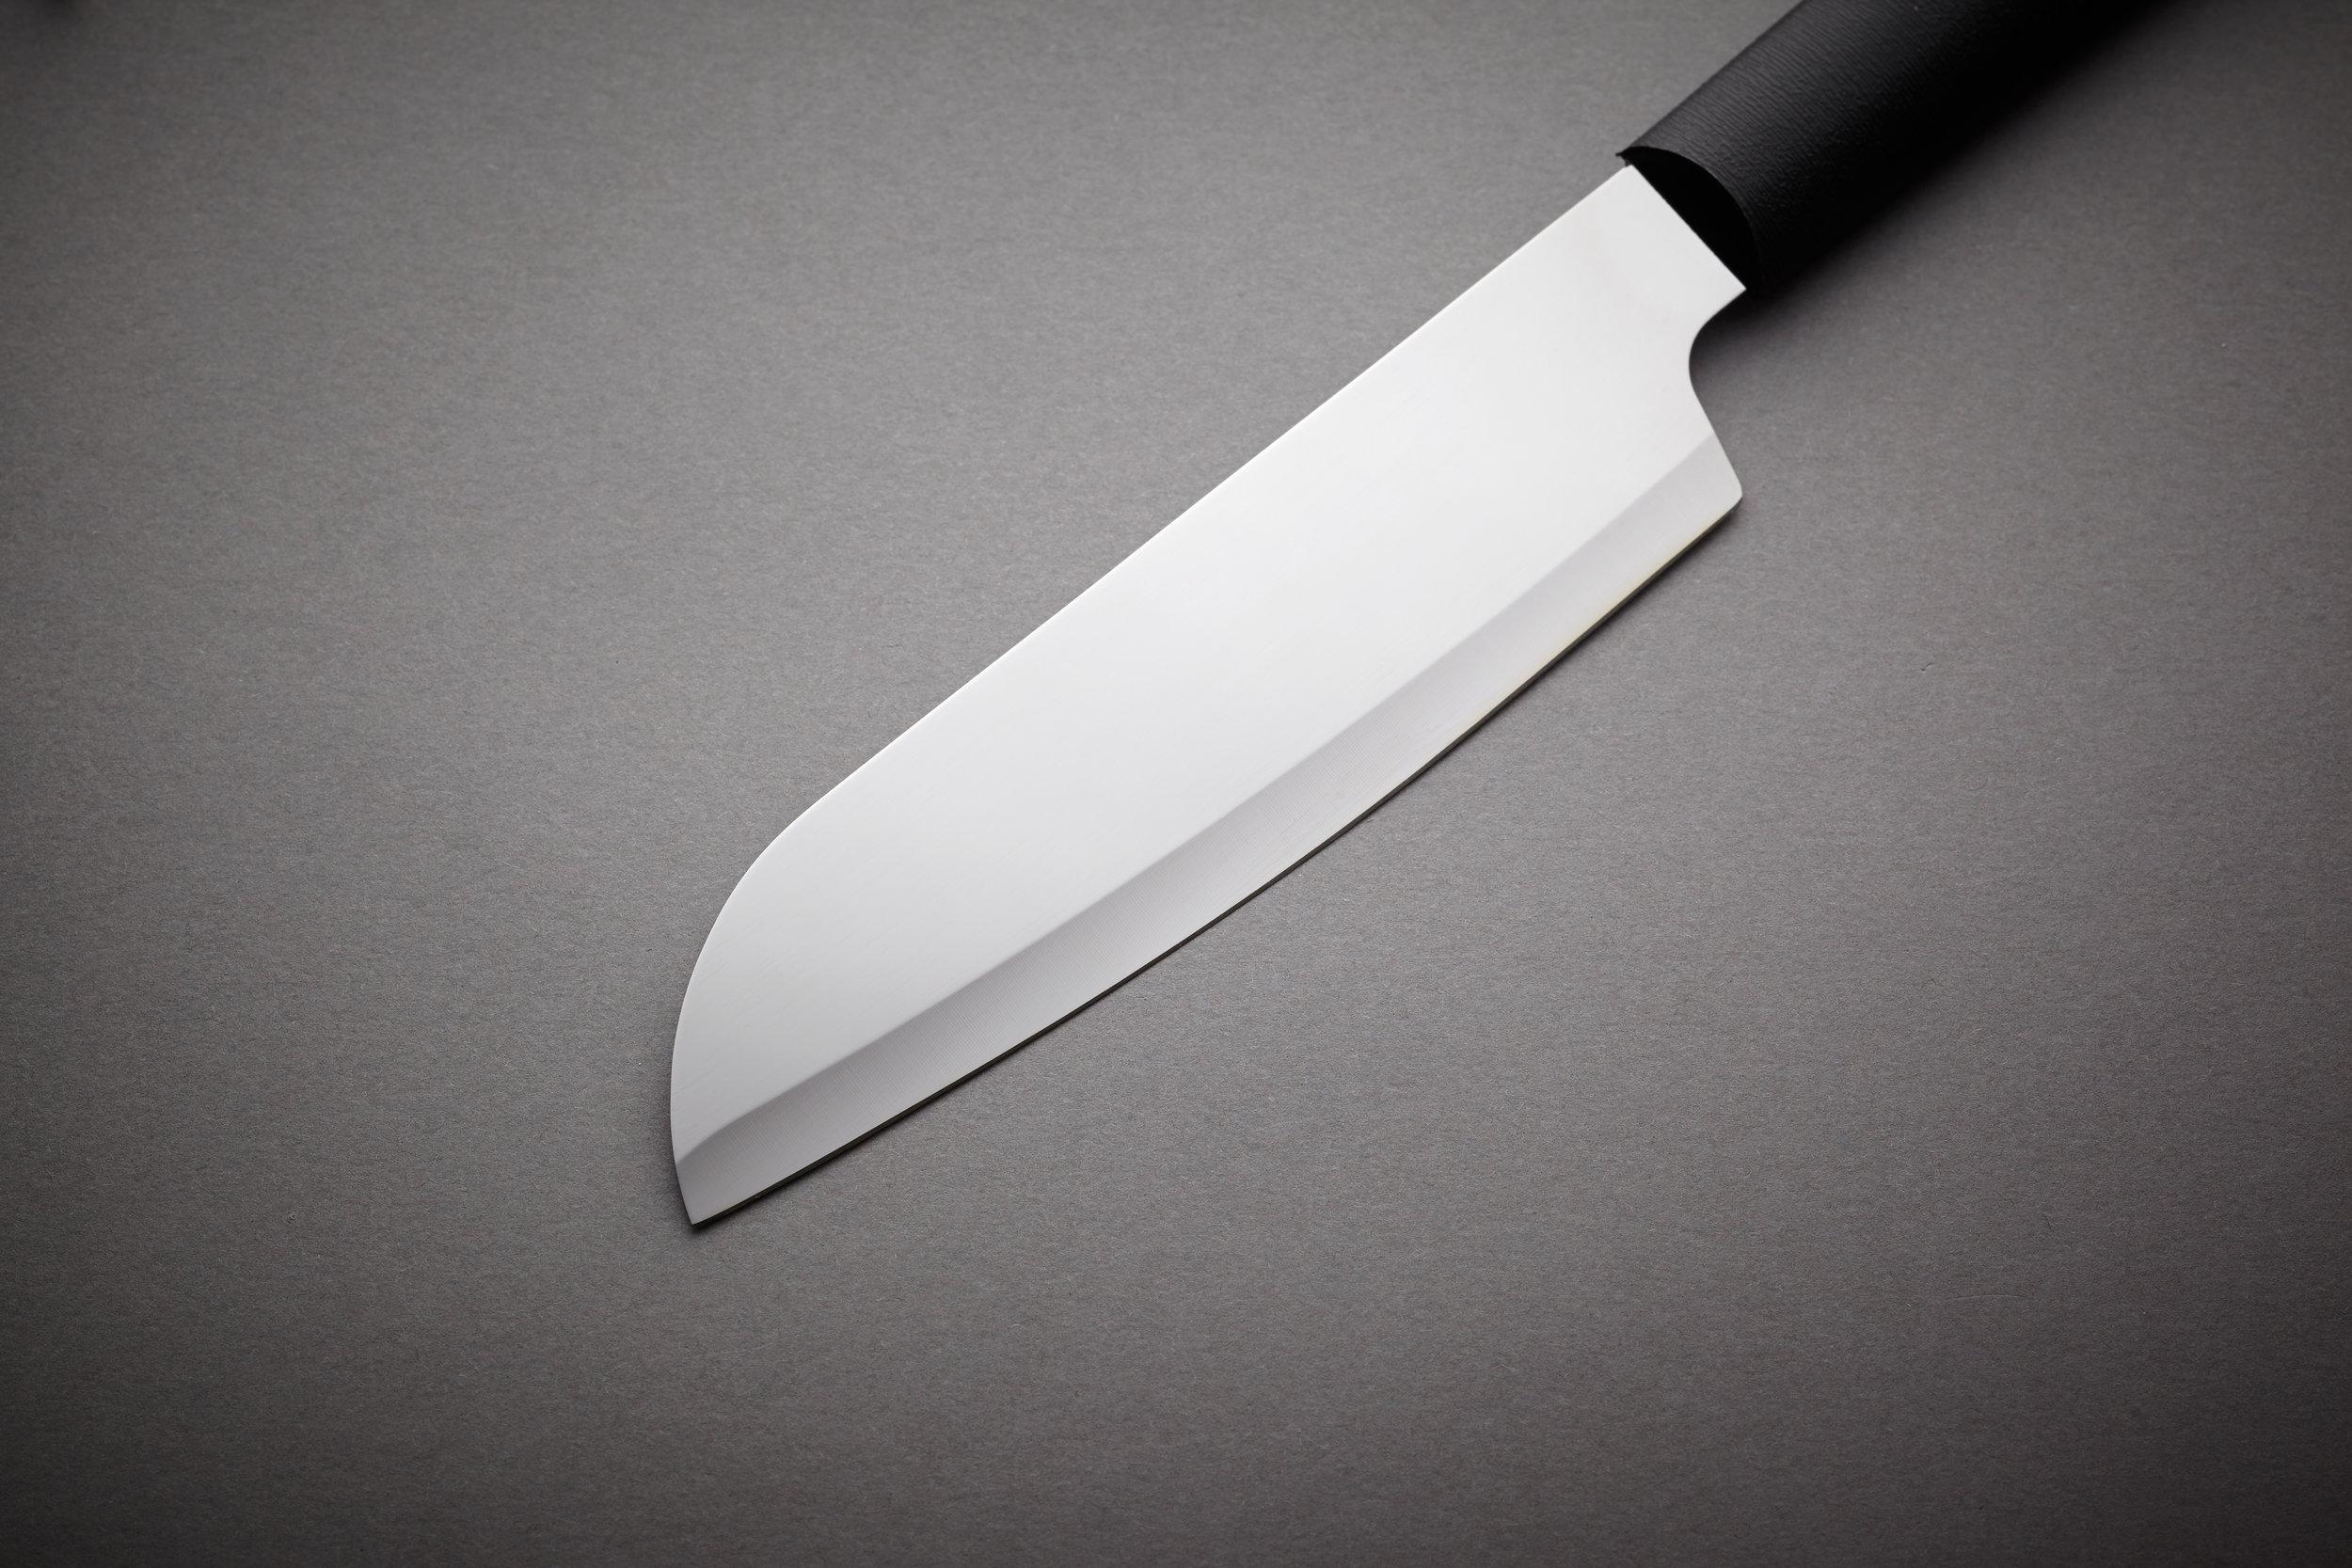 Knife Sharpening, knife making, knife repair